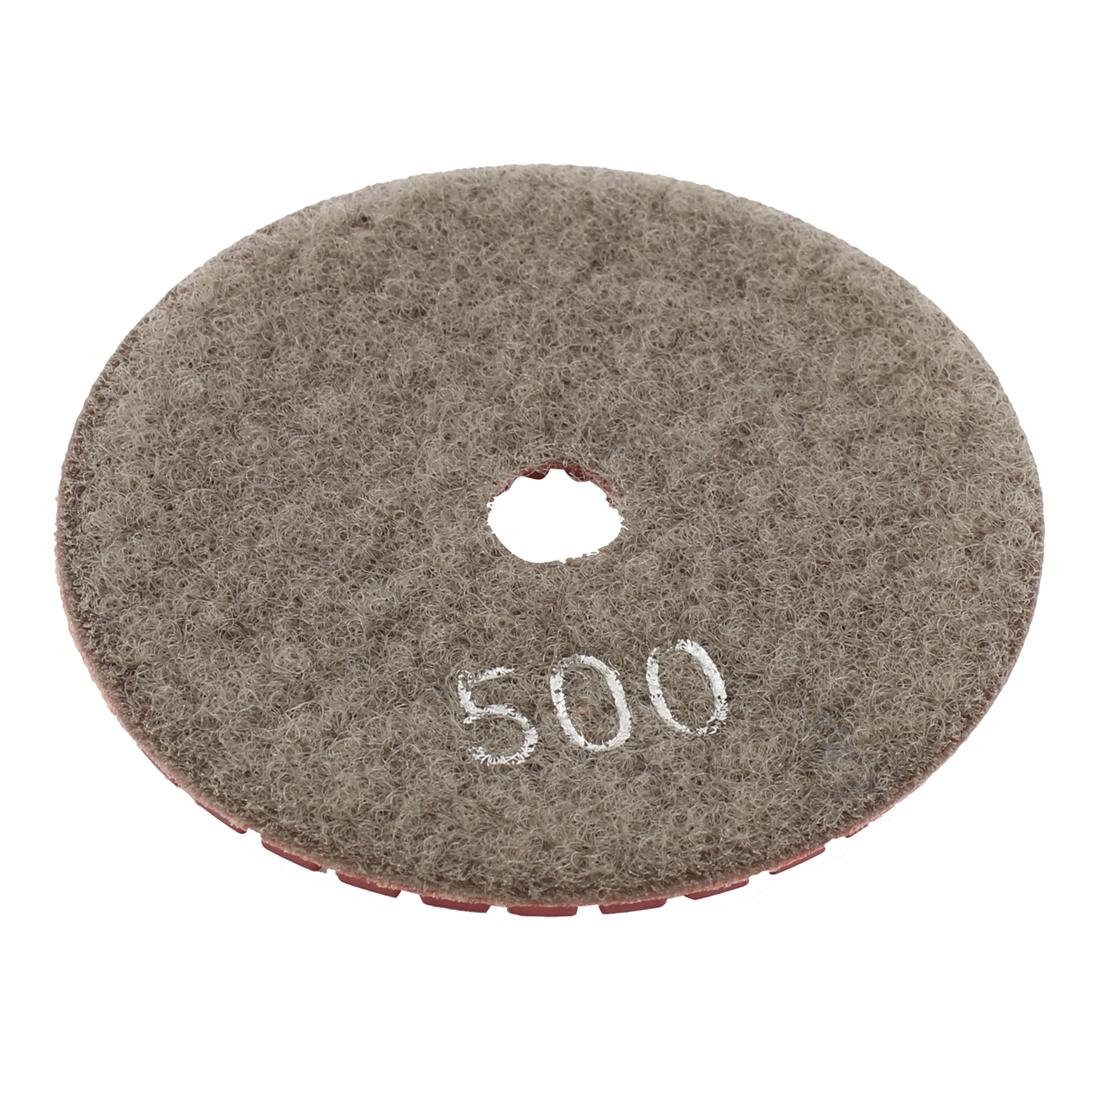 "Wet Dry Granite Concrete Marble Grinder Diamond Polishing Pad 3"" Red Gray"